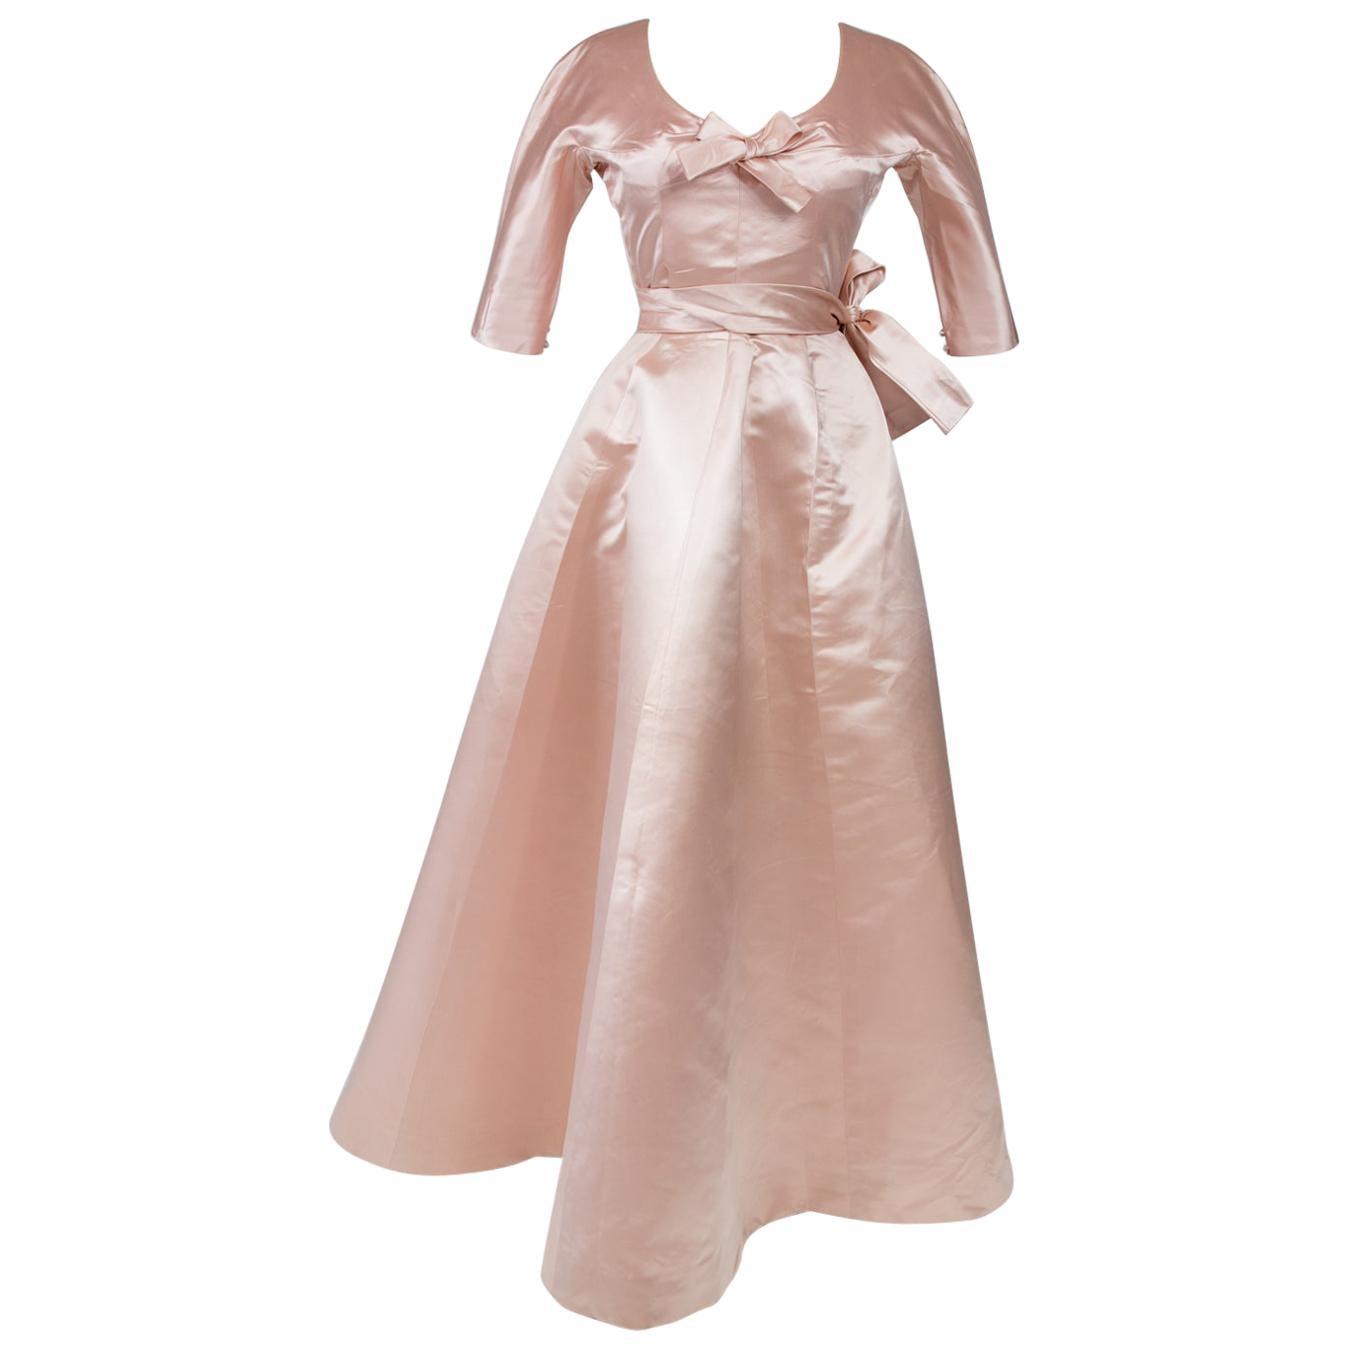 A Cristobal Balenciaga Haute Couture Ball Gown Numbered 61819 - Circa 1960